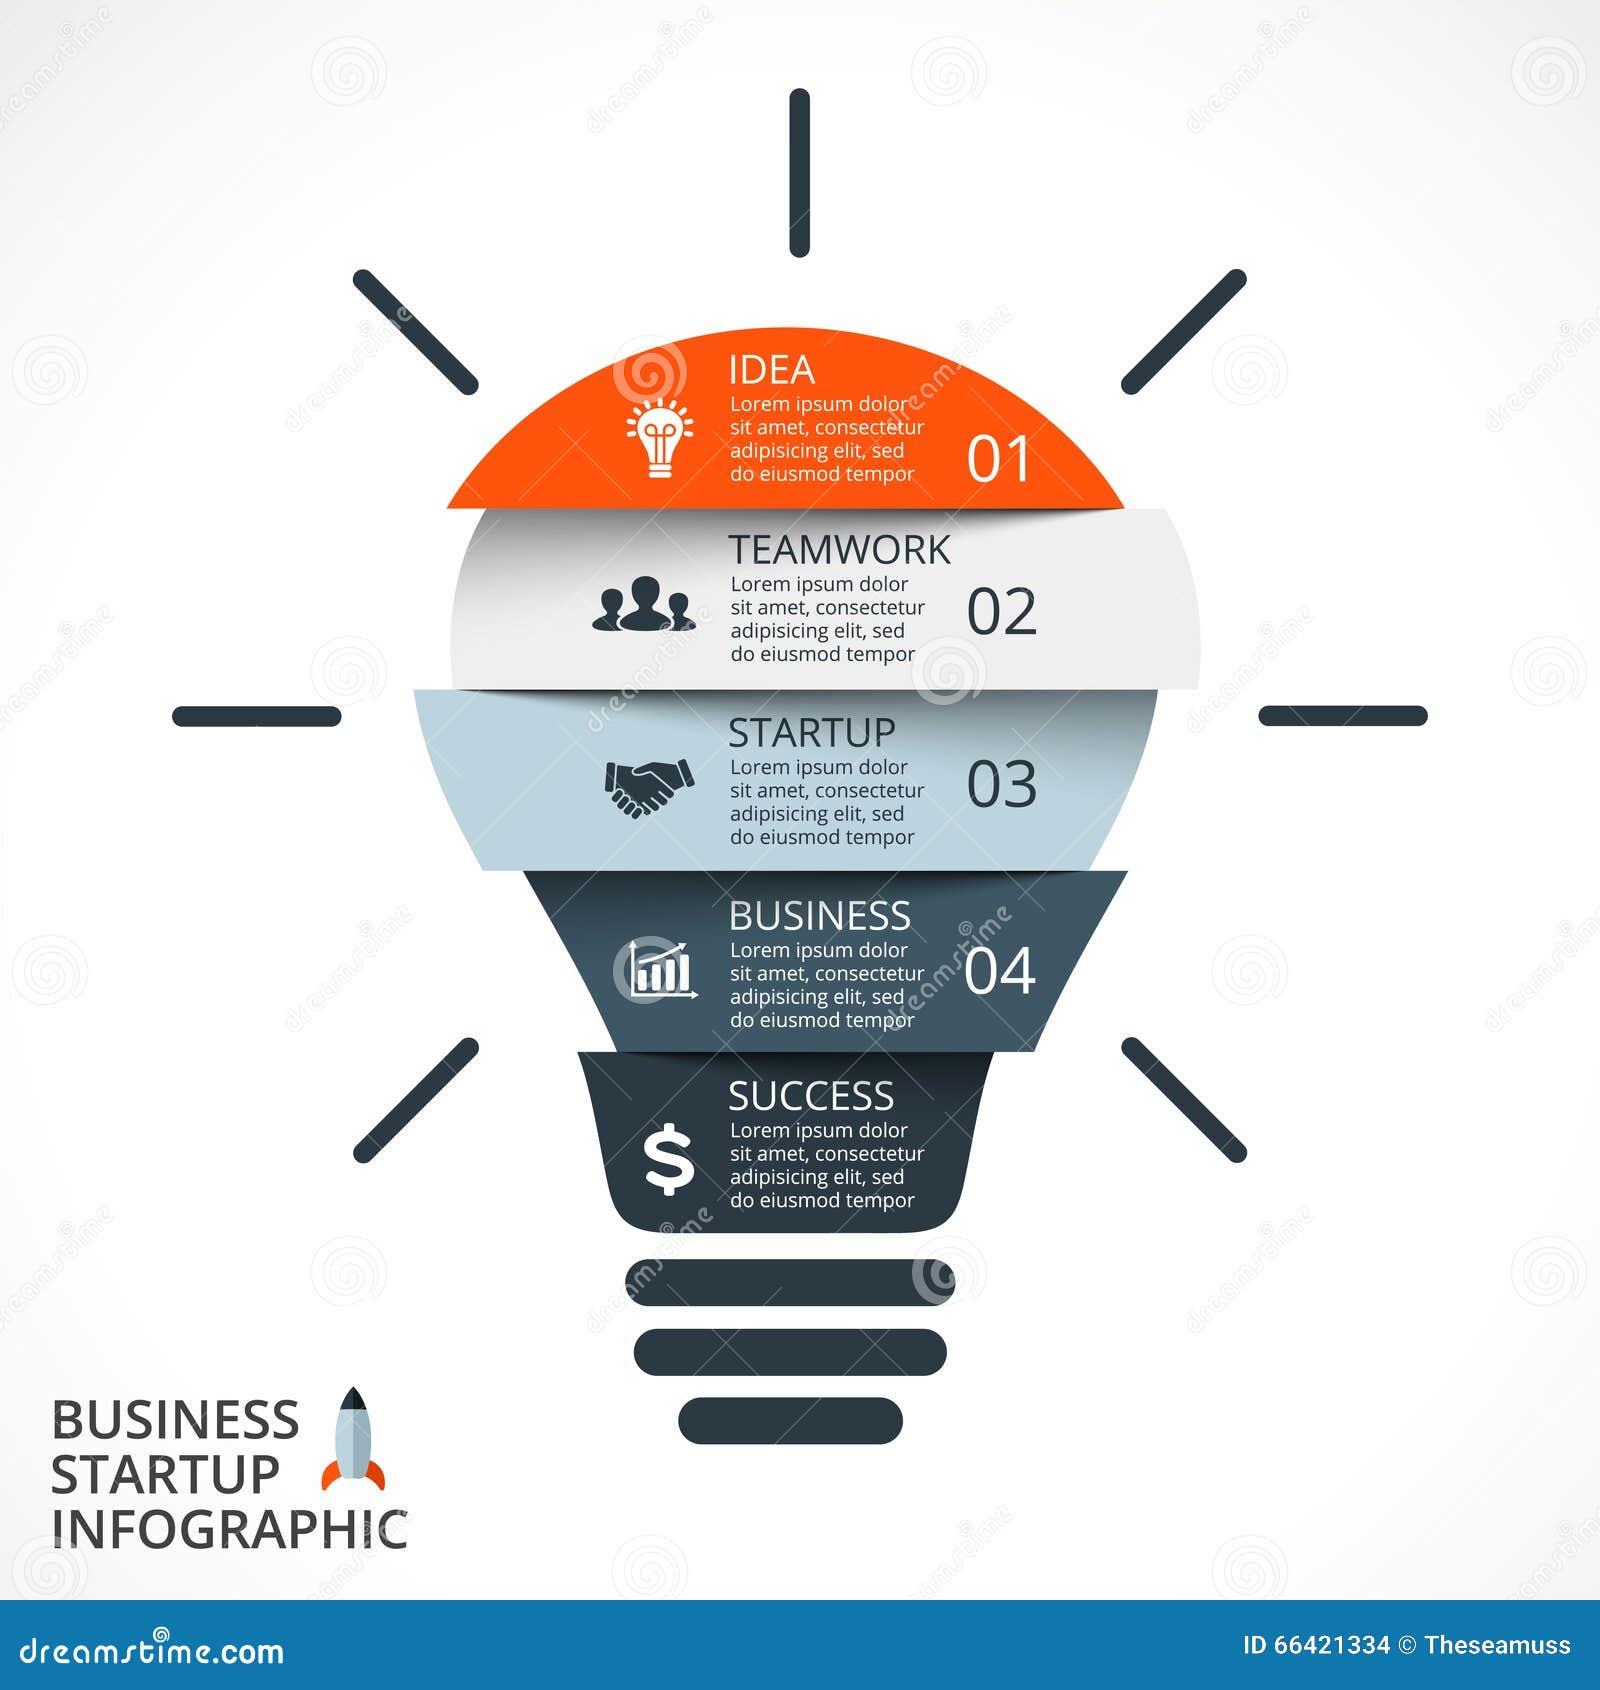 Startup Framework™ - Business Modeling and Planning Tools for Startup Teams